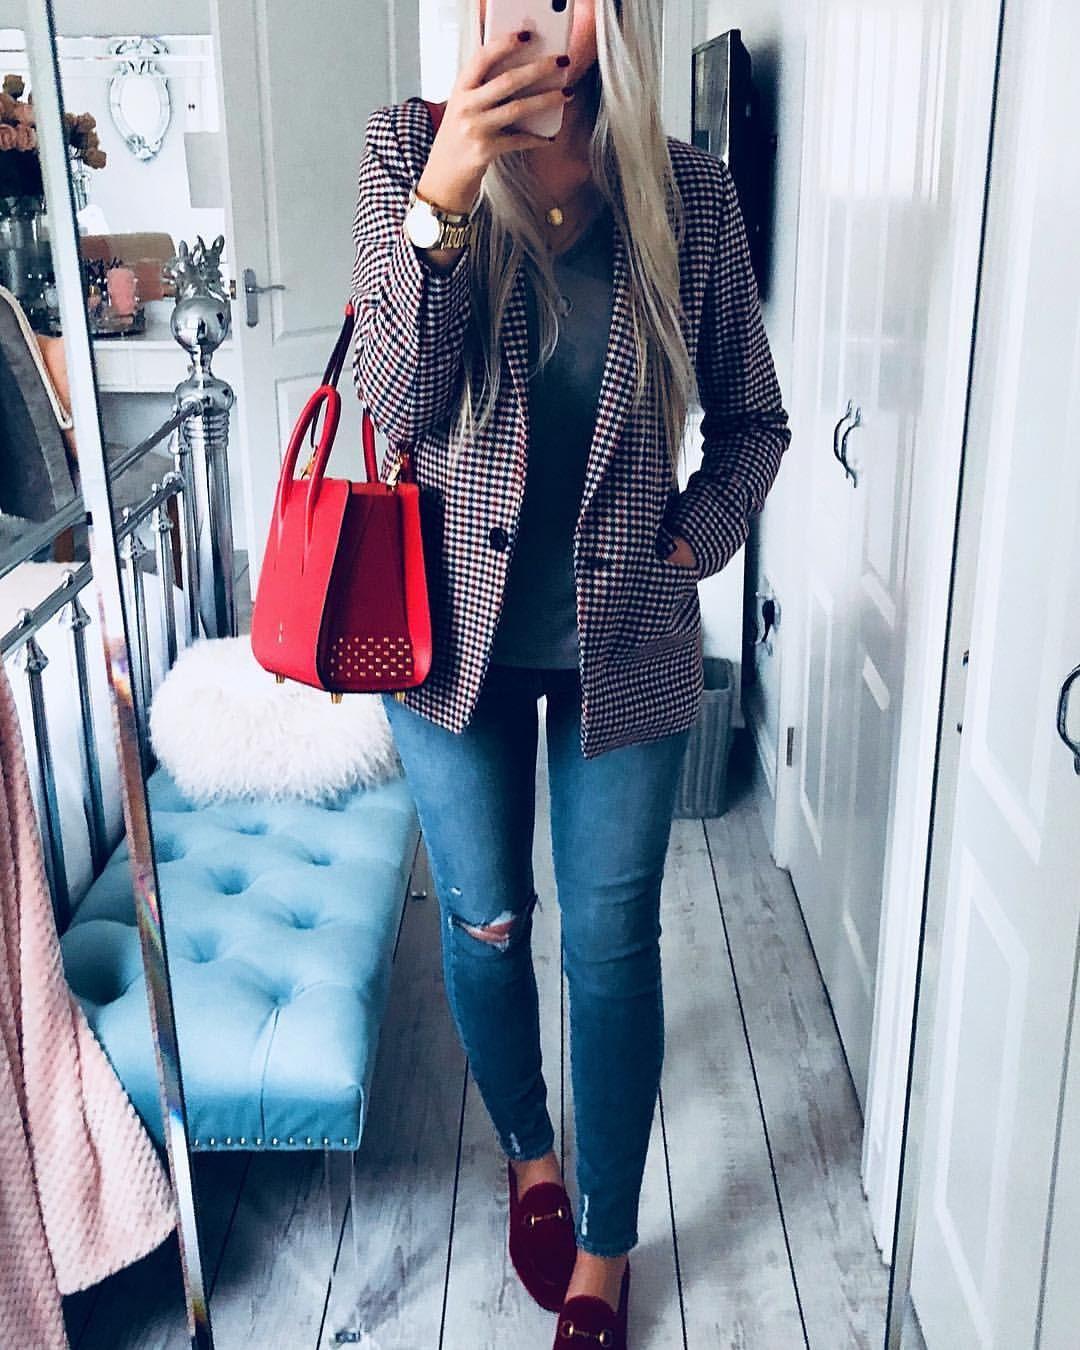 608ce813f Instagram @emilyjanehardy Sandro check jacket, louboutin paloma bag, paige  denim, red velvet Gucci Jordaan loafers